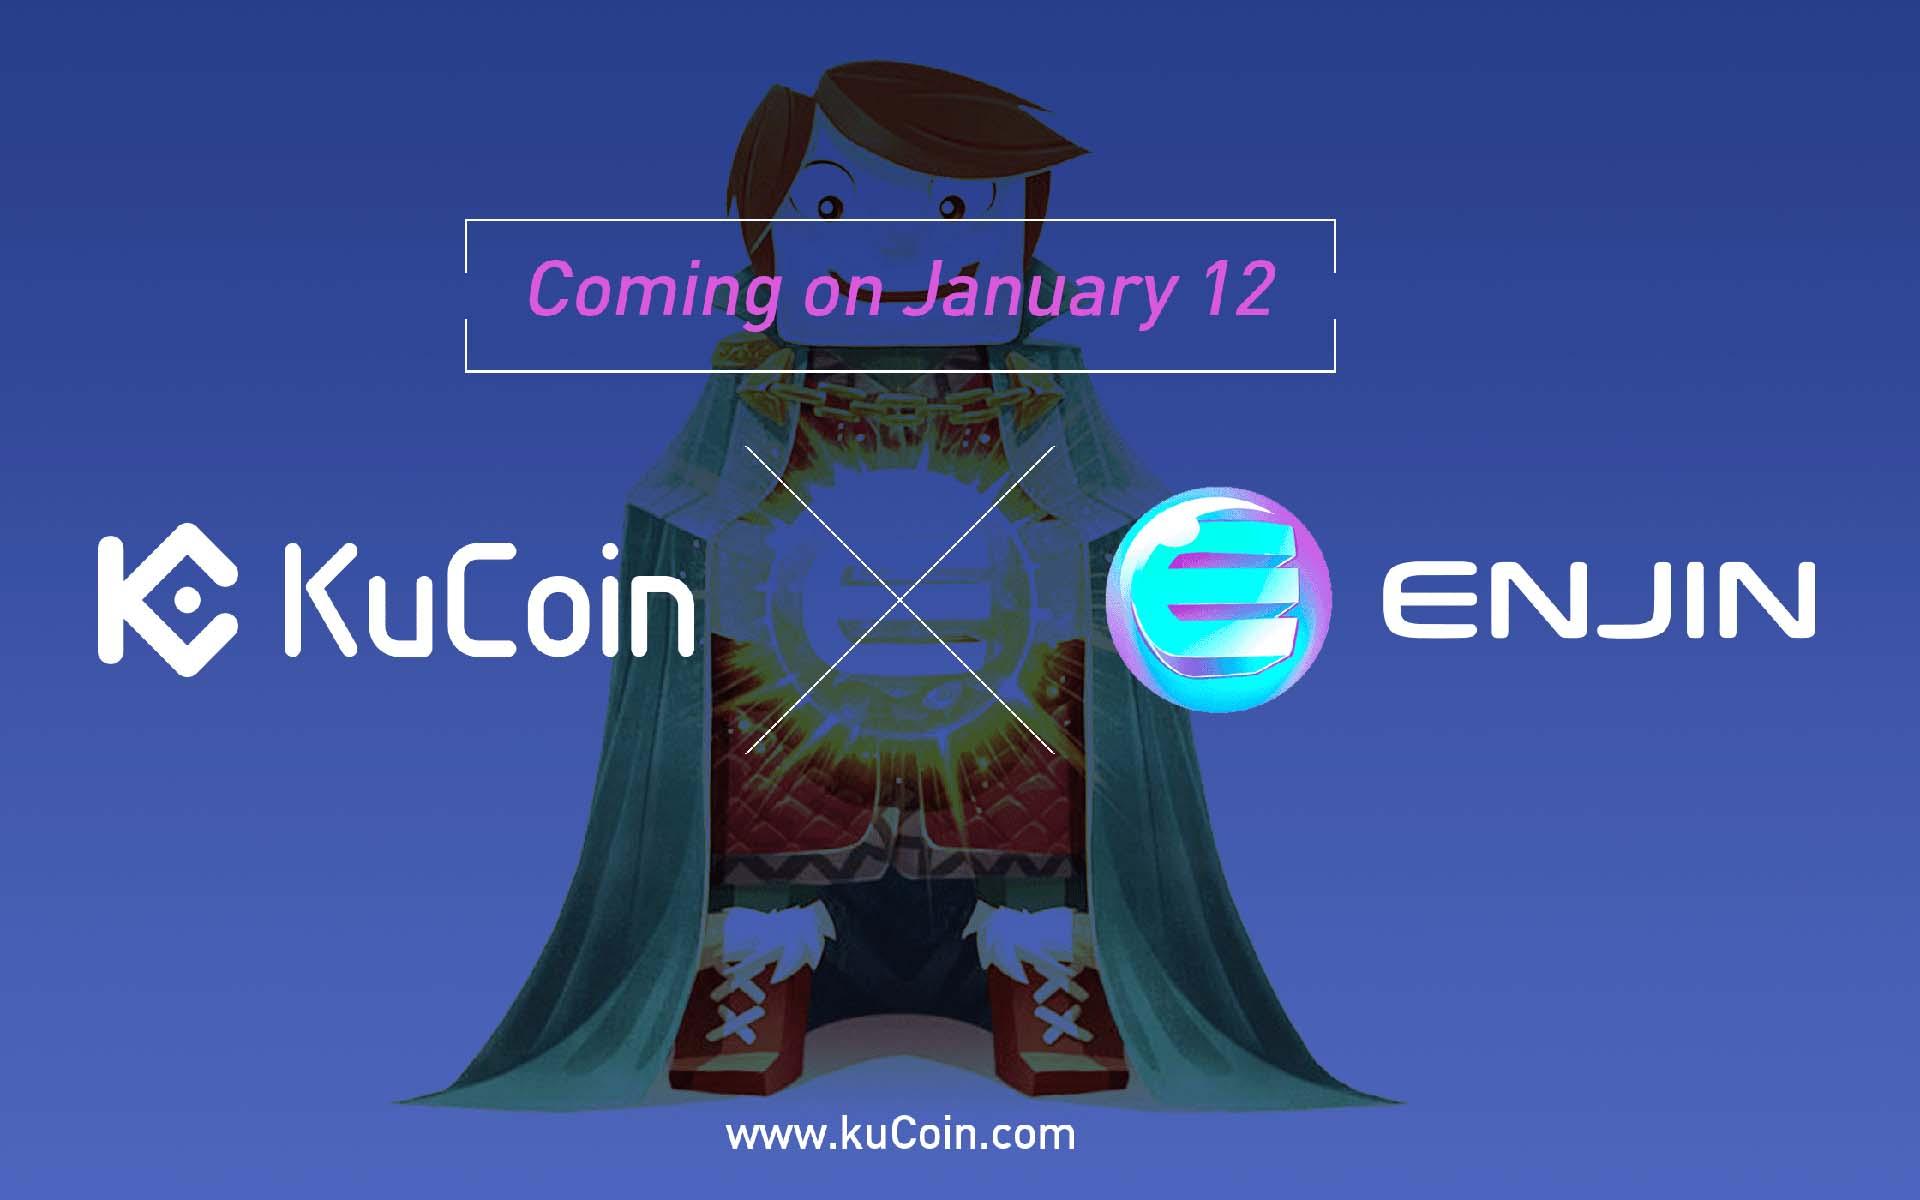 Enjin (ENJ) Now Trading on KuCoin - ENJ/BTC and ENJ/ETH